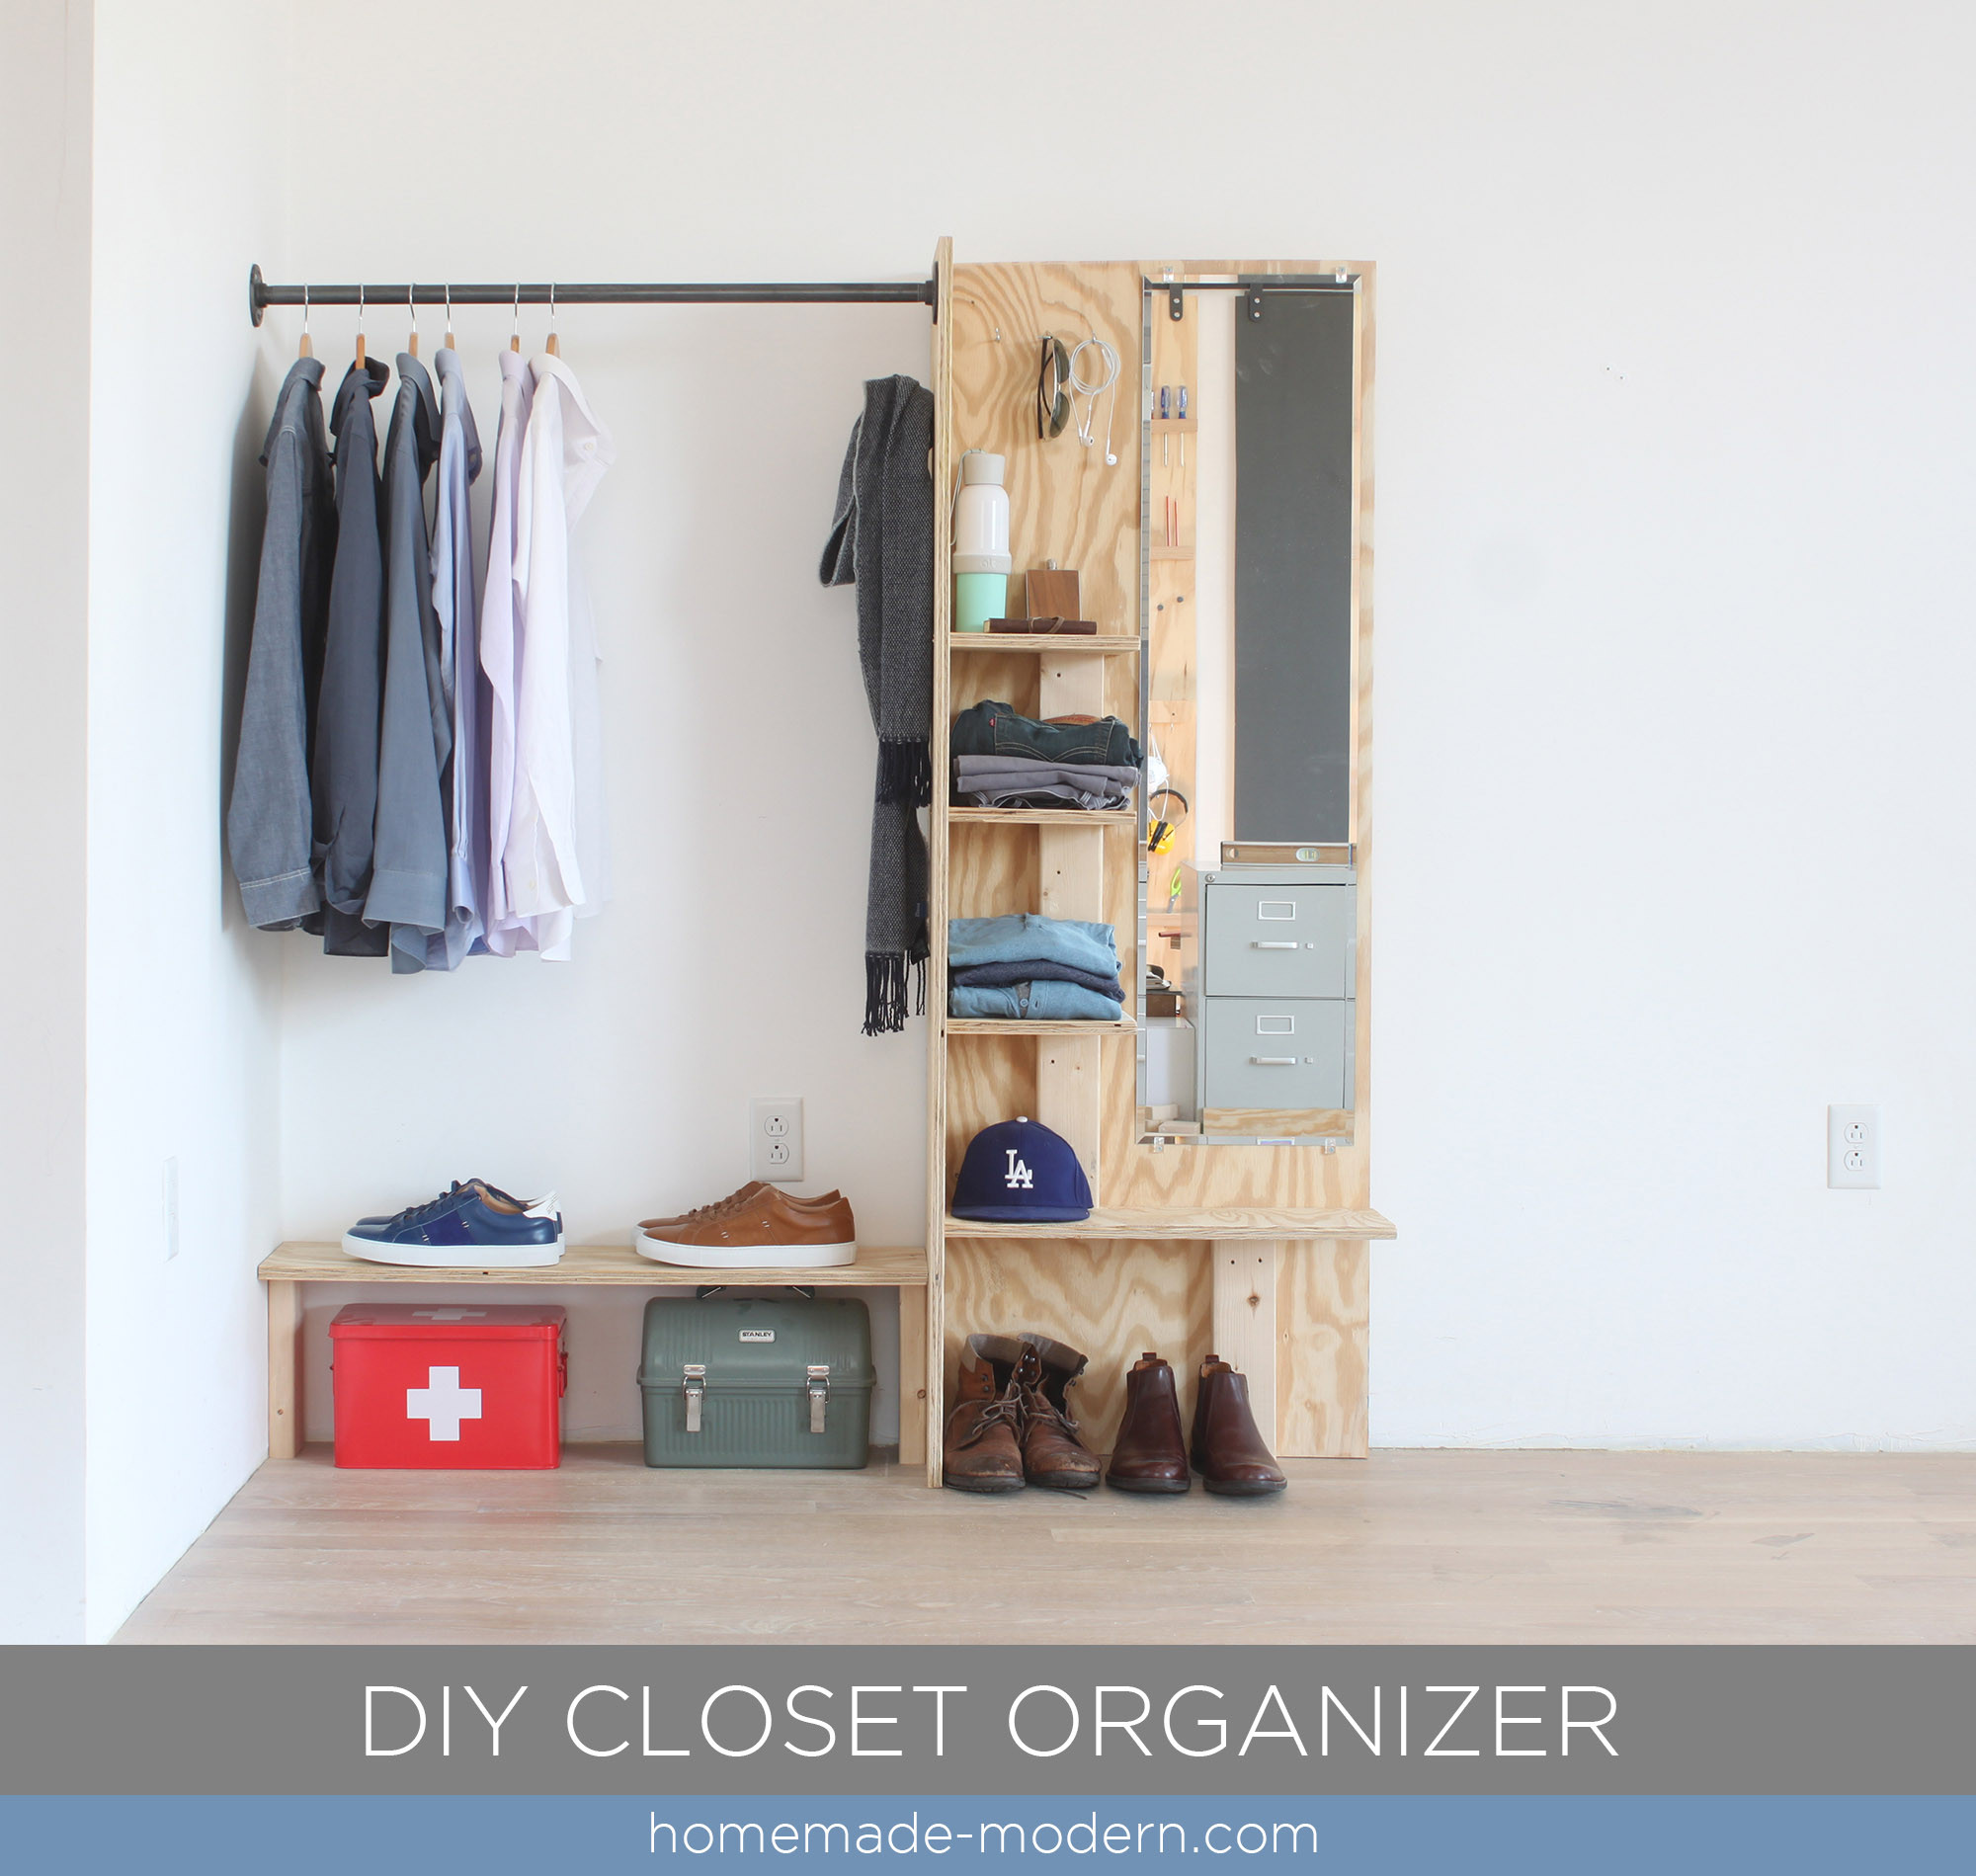 Best ideas about DIY Closet Organizer . Save or Pin HomeMade Modern EP98 DIY Closet Organizer Now.